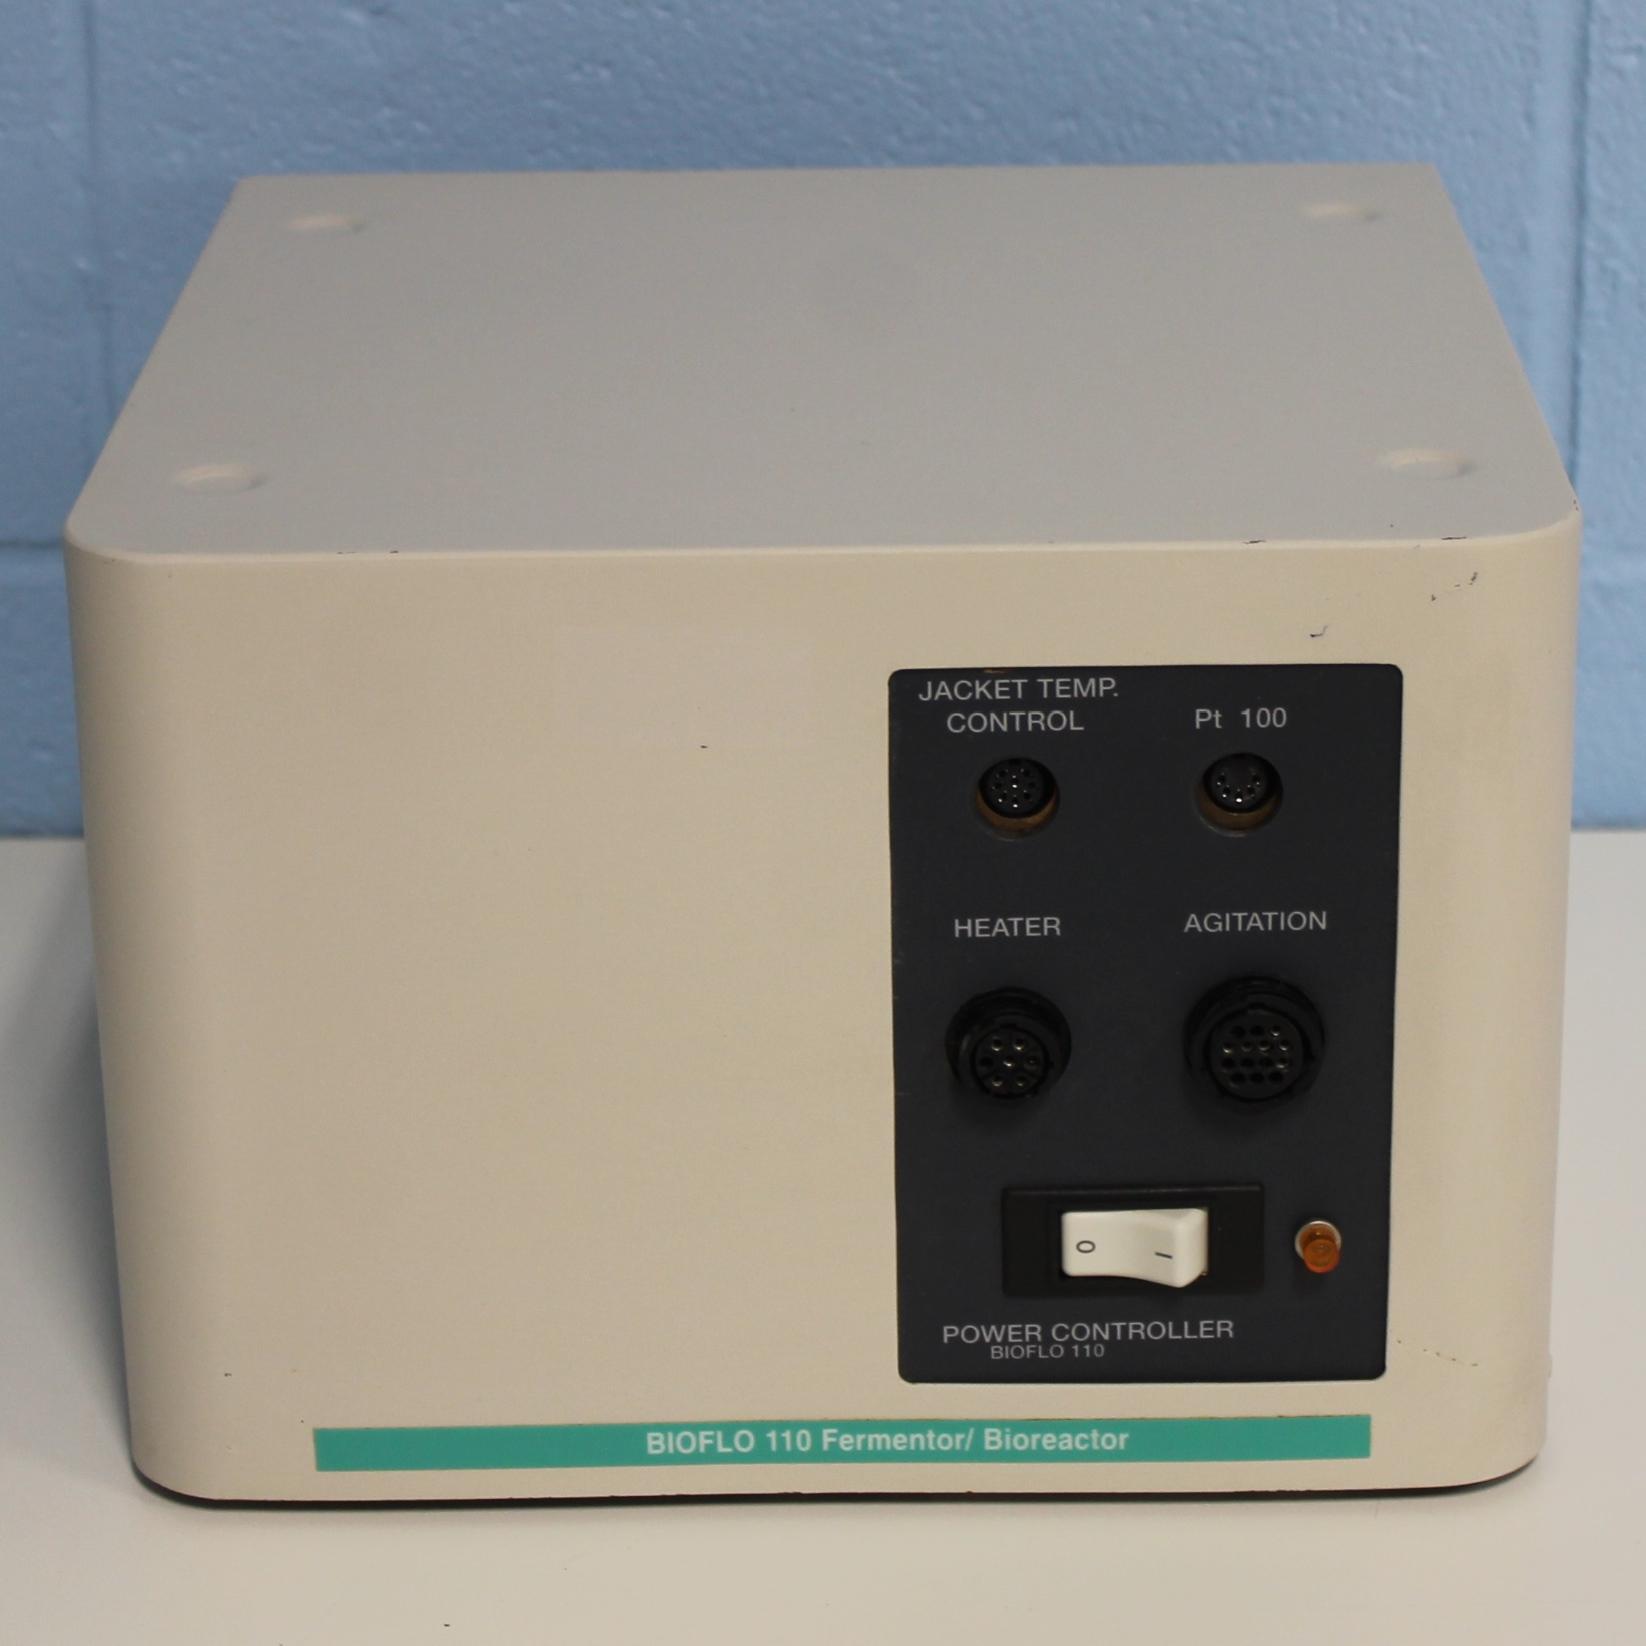 New Brunswick Scientific Co BioFlo 110 Power Controller P/N R1273-3100-002 Image